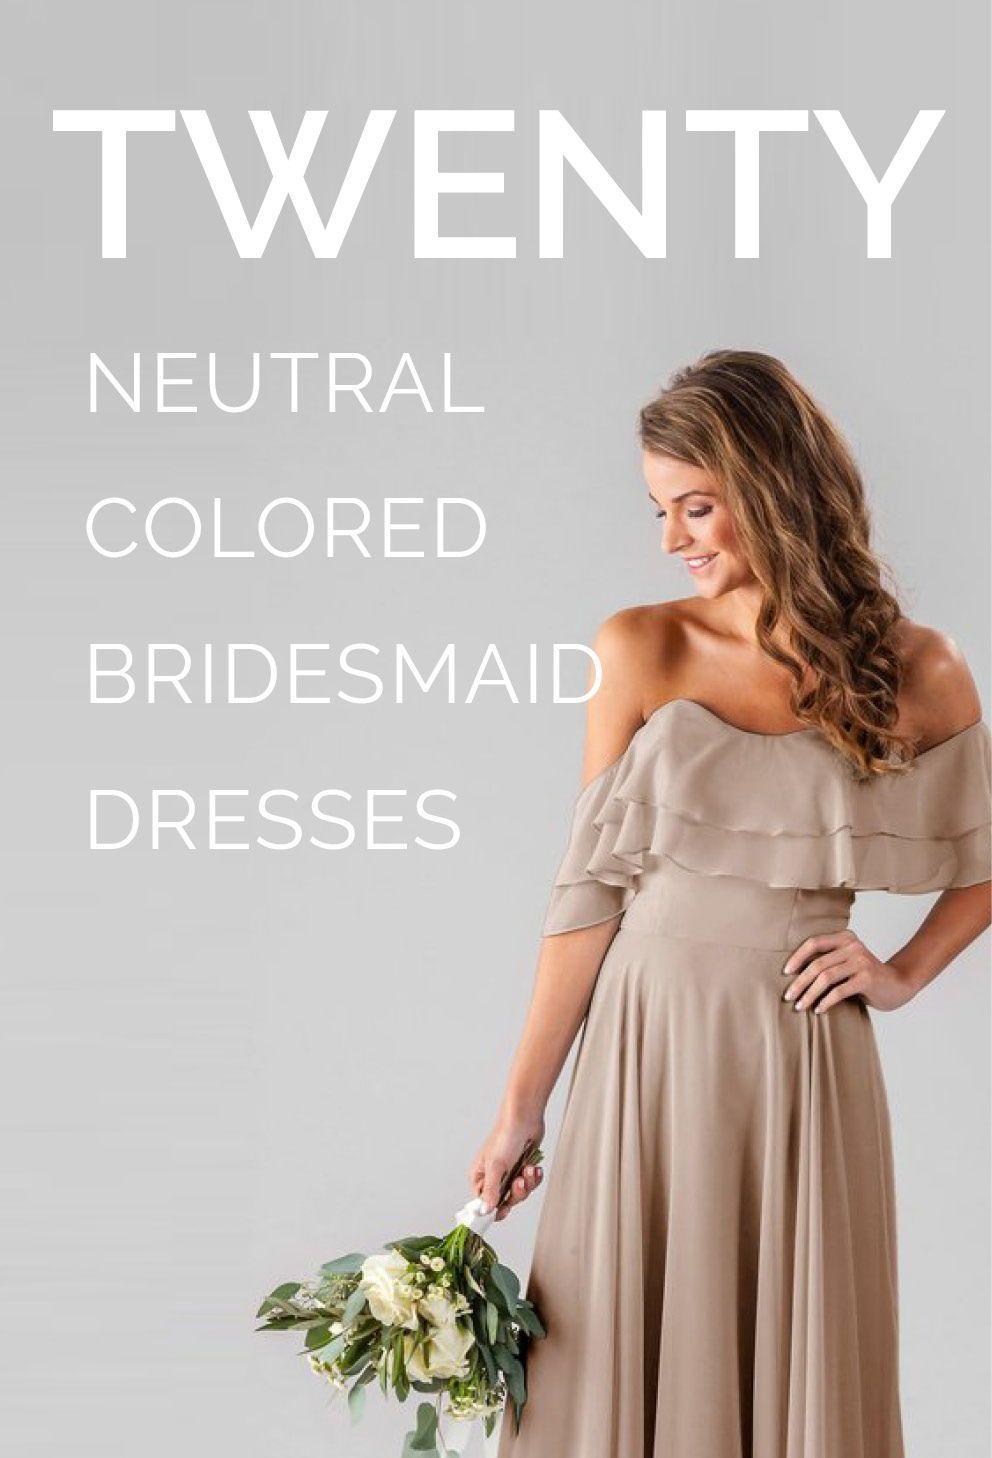 20 Neutral Colored Bridesmaid Dresses Ivory Bridesmaid Dresses Mauve Bridesmaid Dress Neutral Bridesmaid Dresses